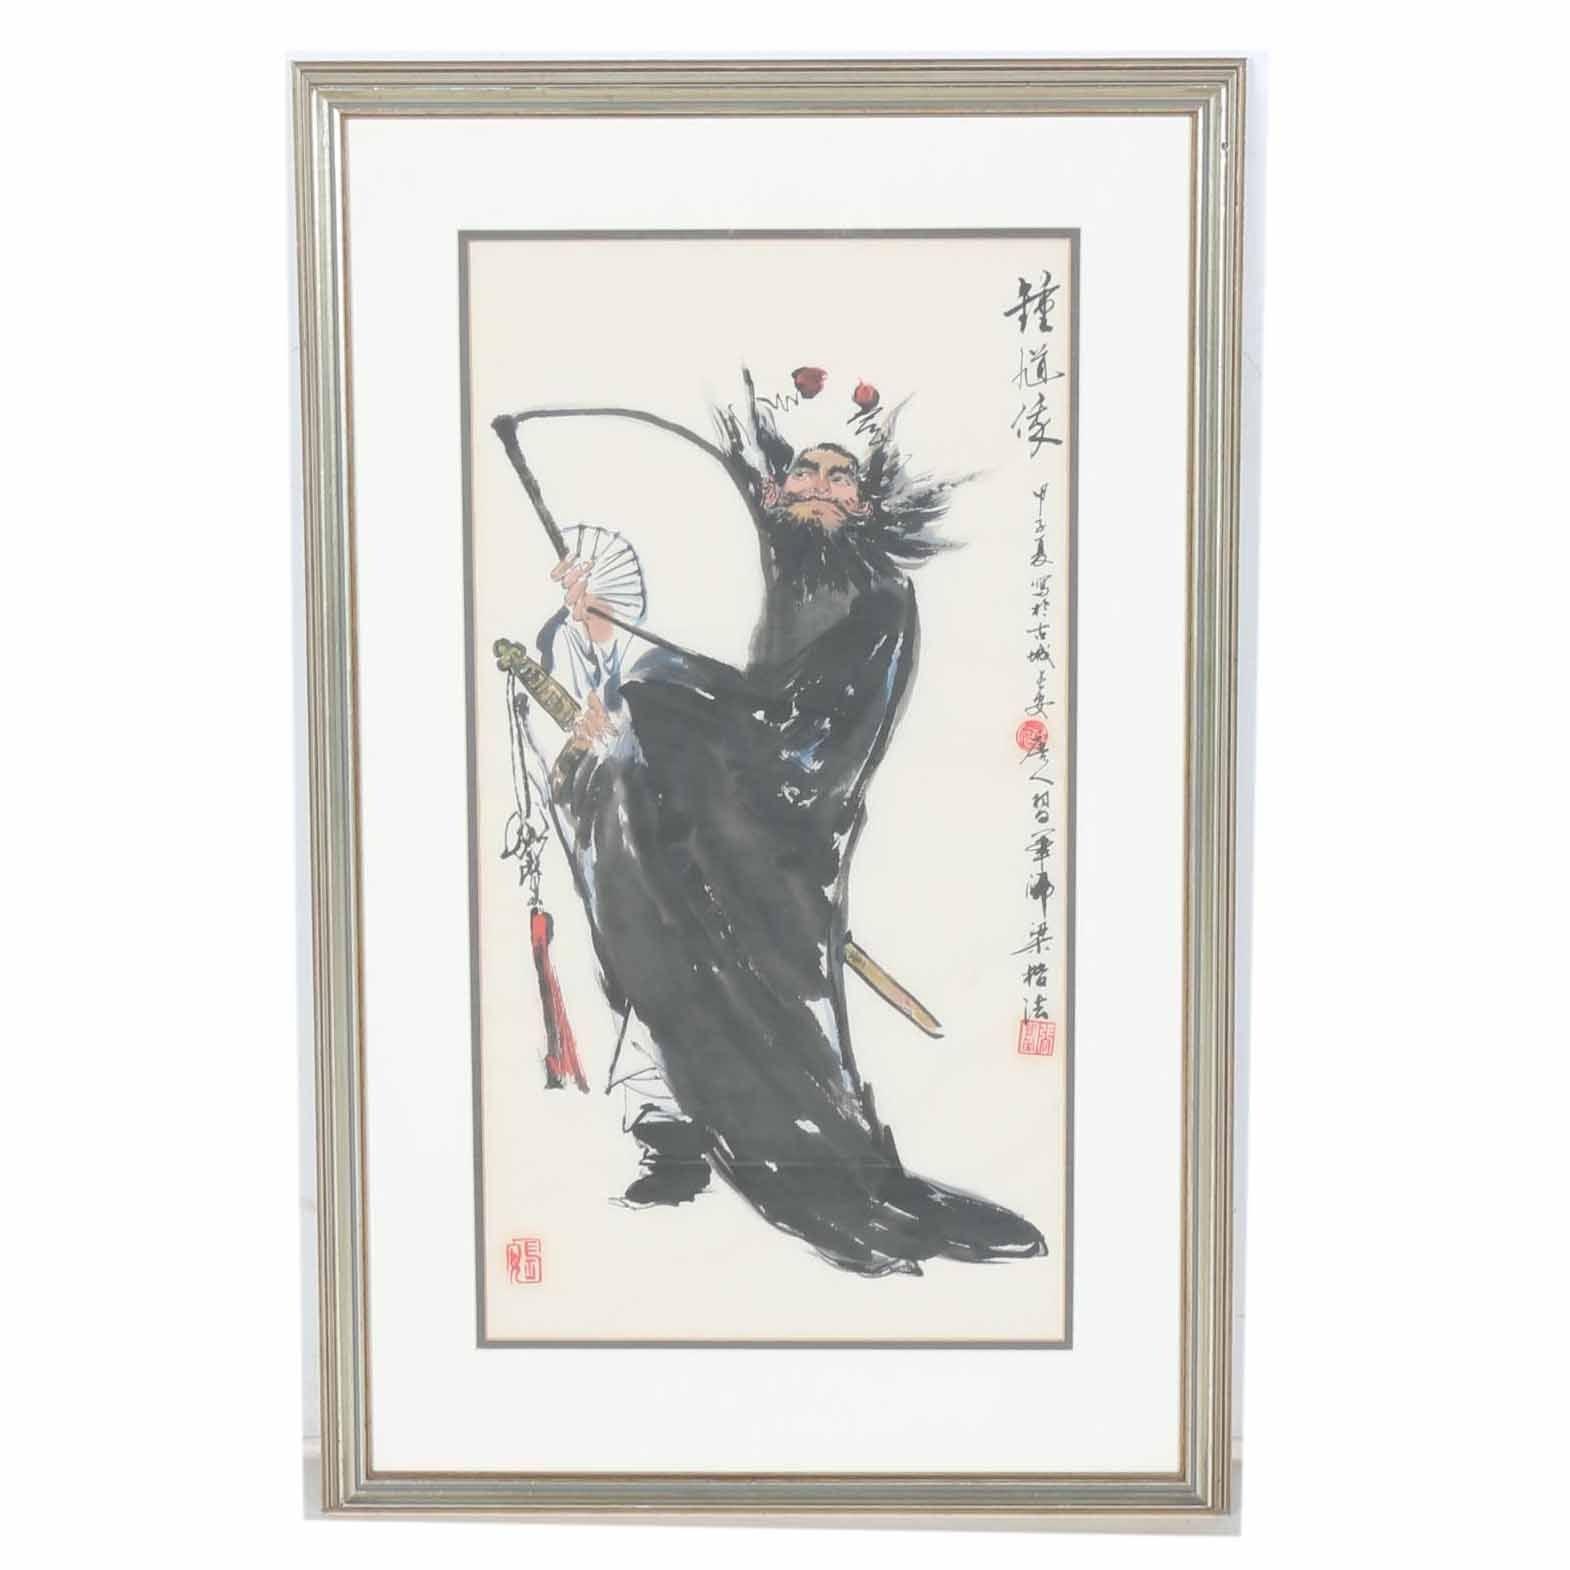 Chinese Watercolor Painting of Zhongli Quan